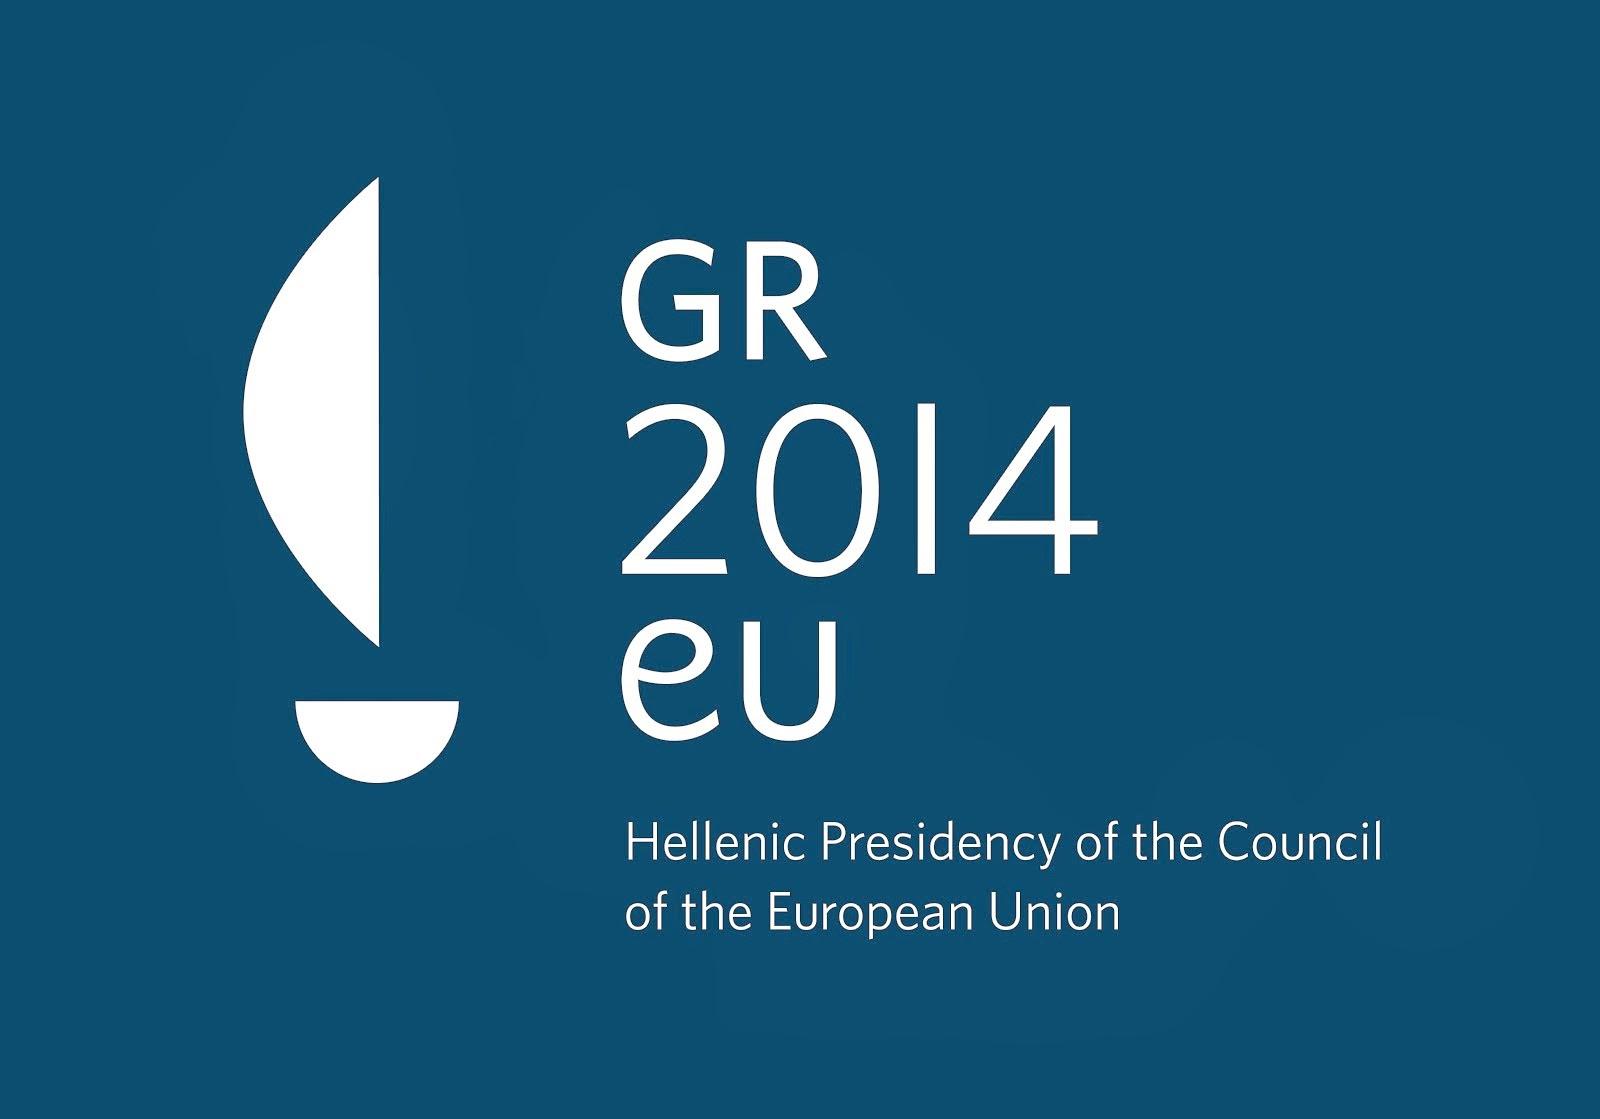 Presidência da Grécia